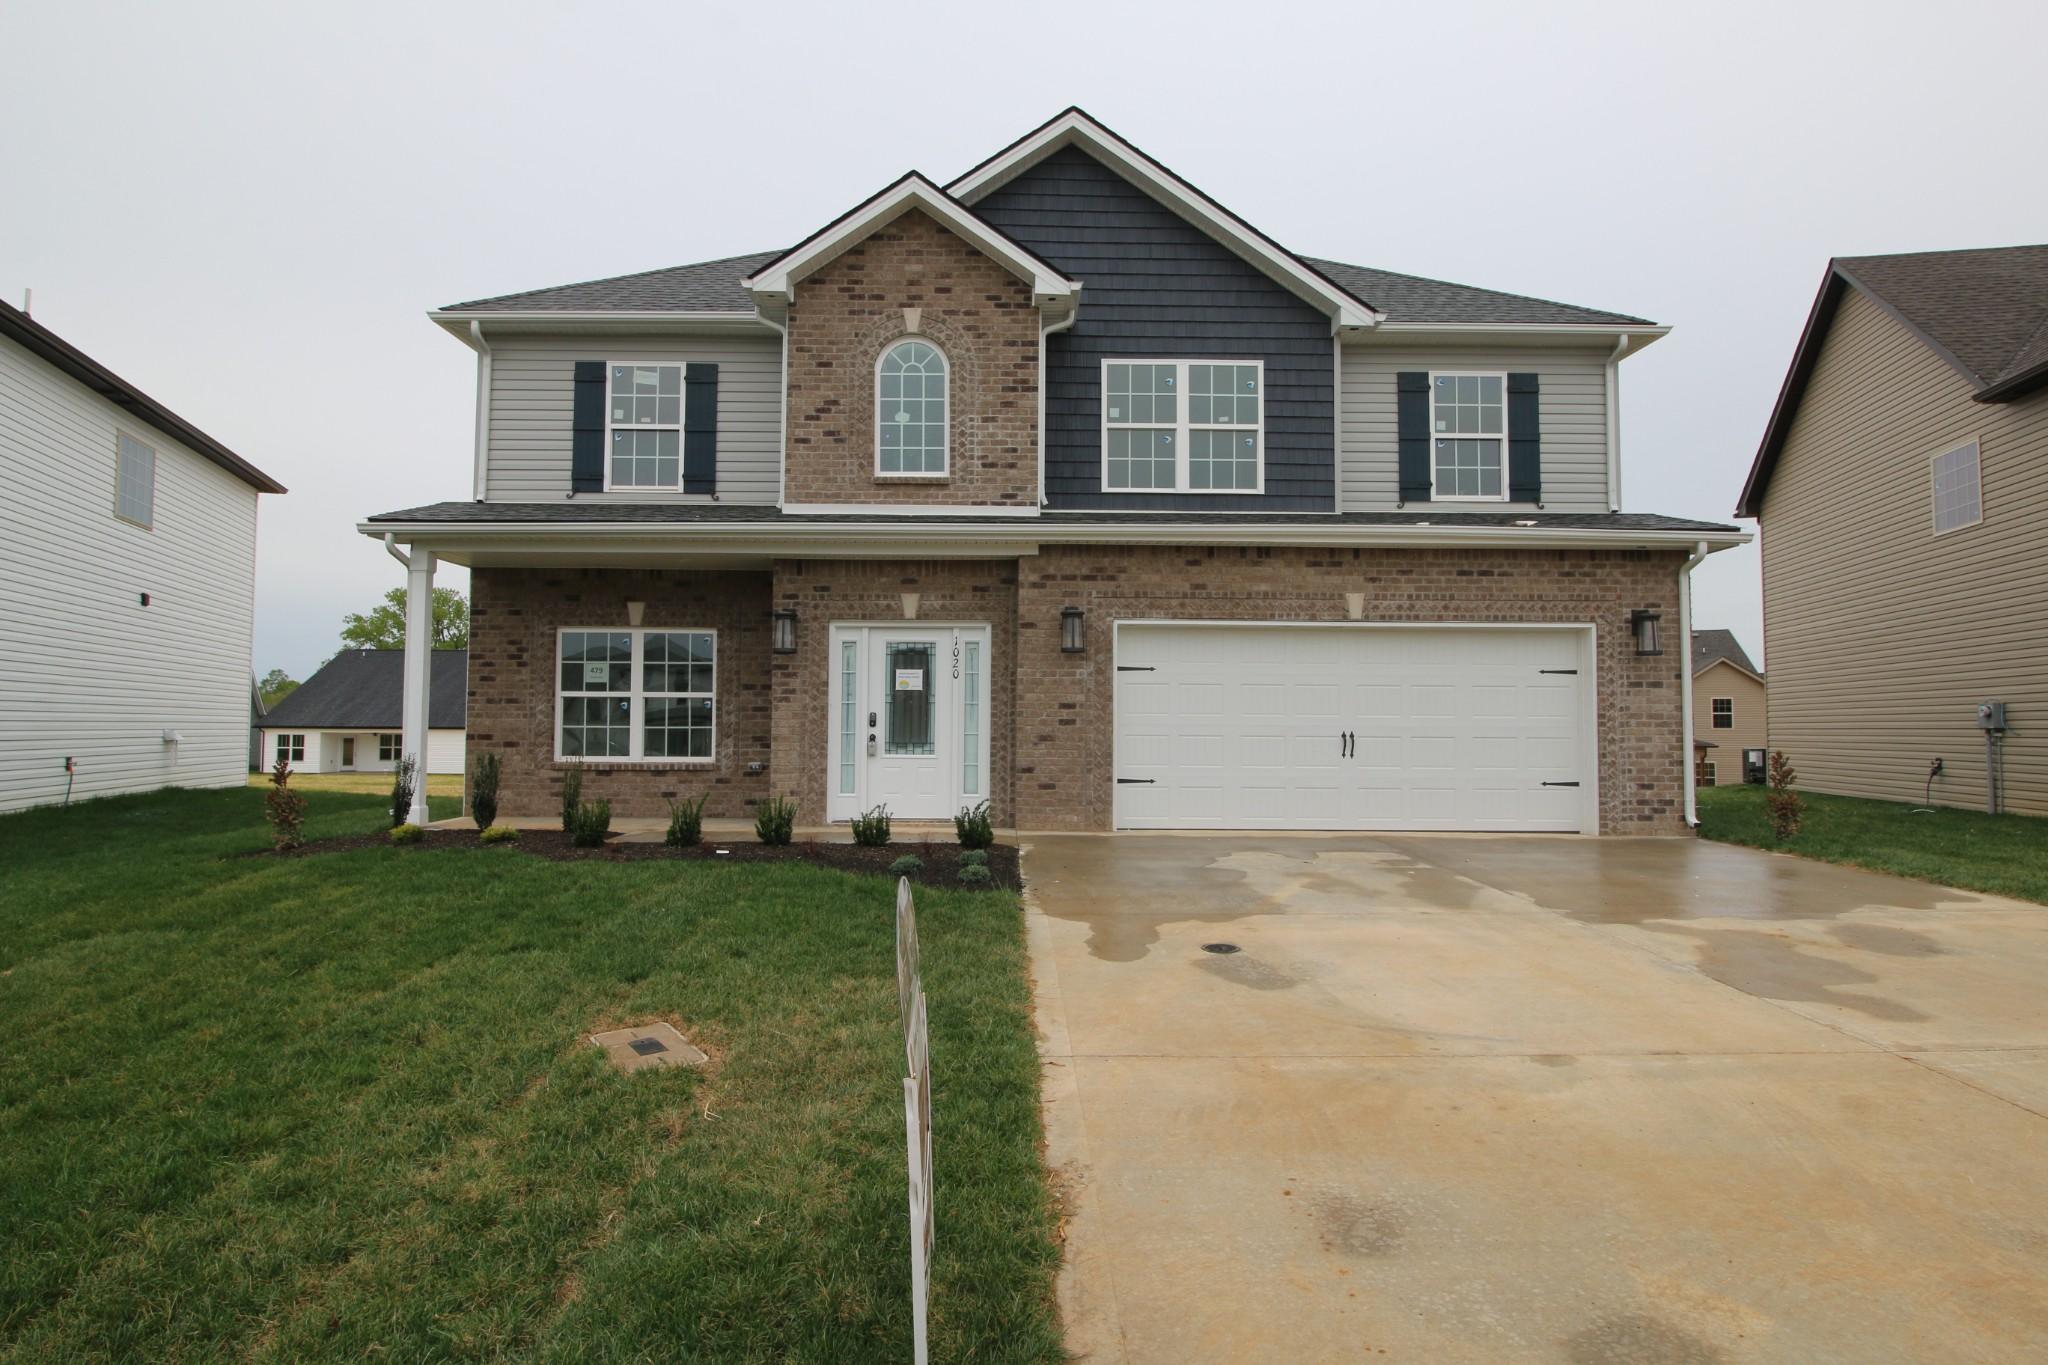 479 Autumn Creek Property Photo - Clarksville, TN real estate listing